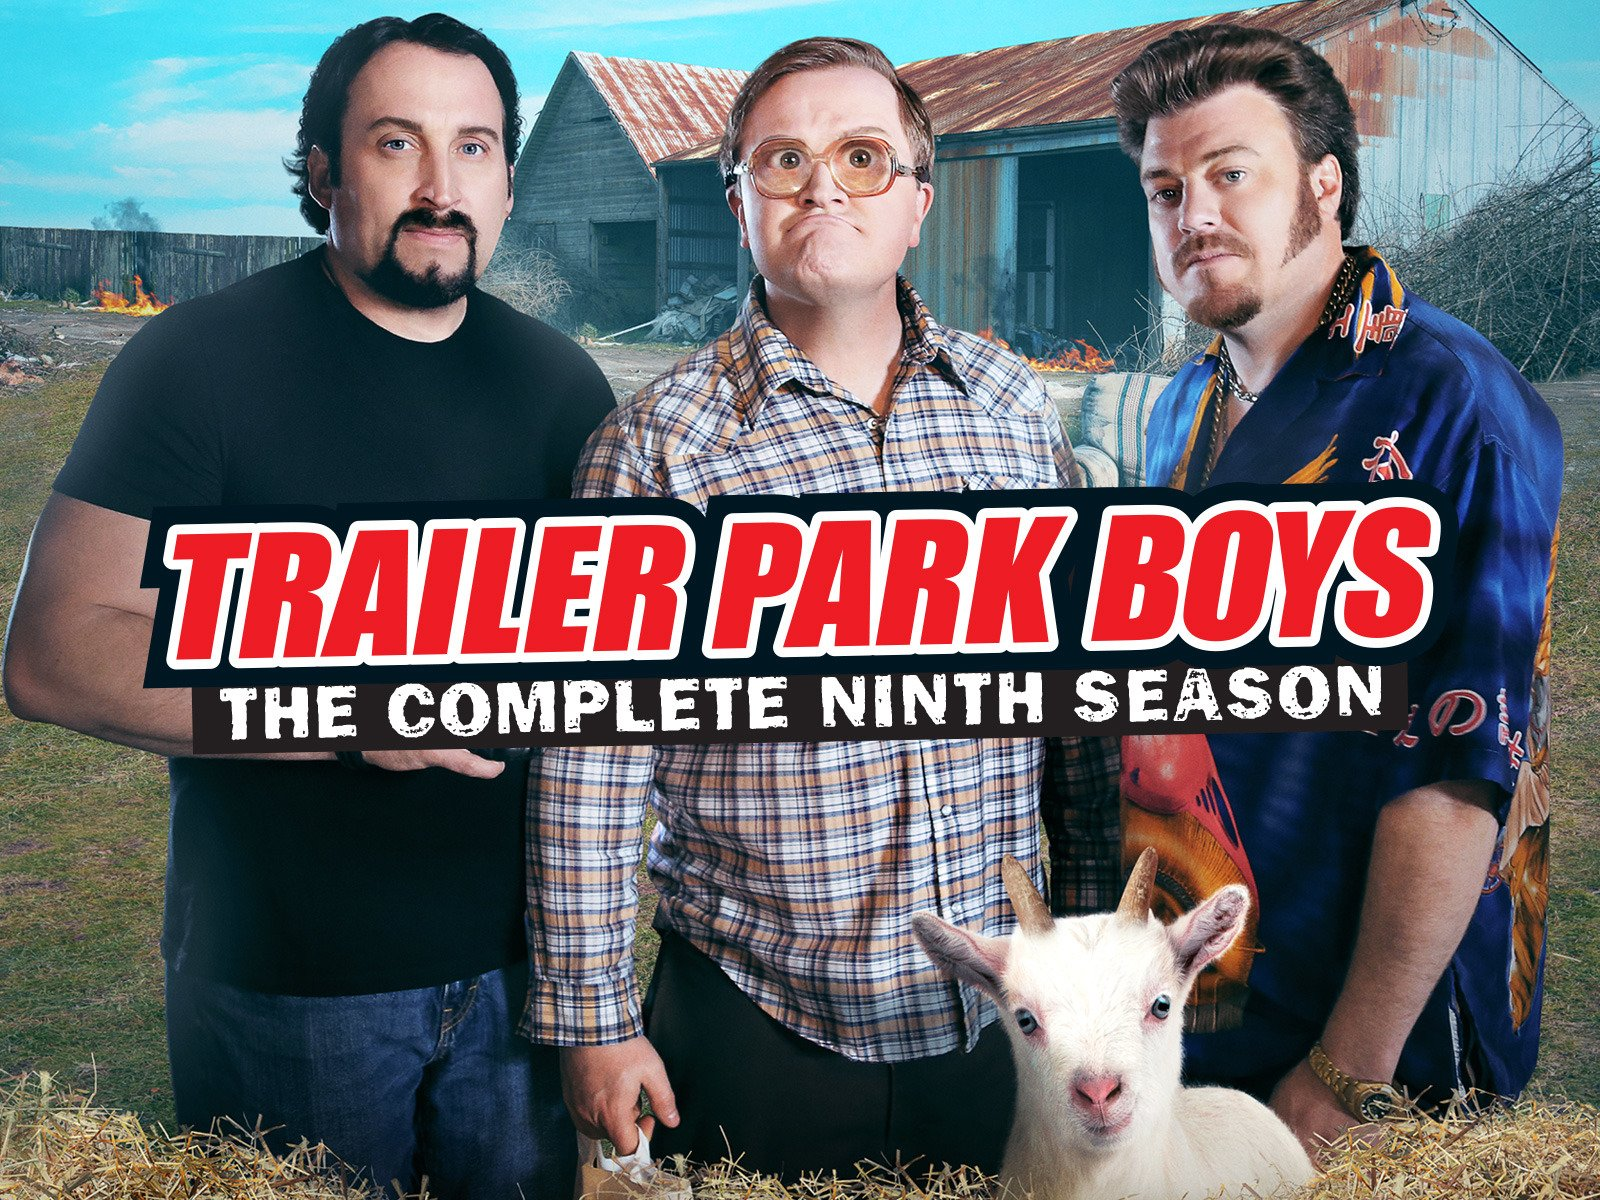 Watch Trailer Park Boys Season 8 Prime Video